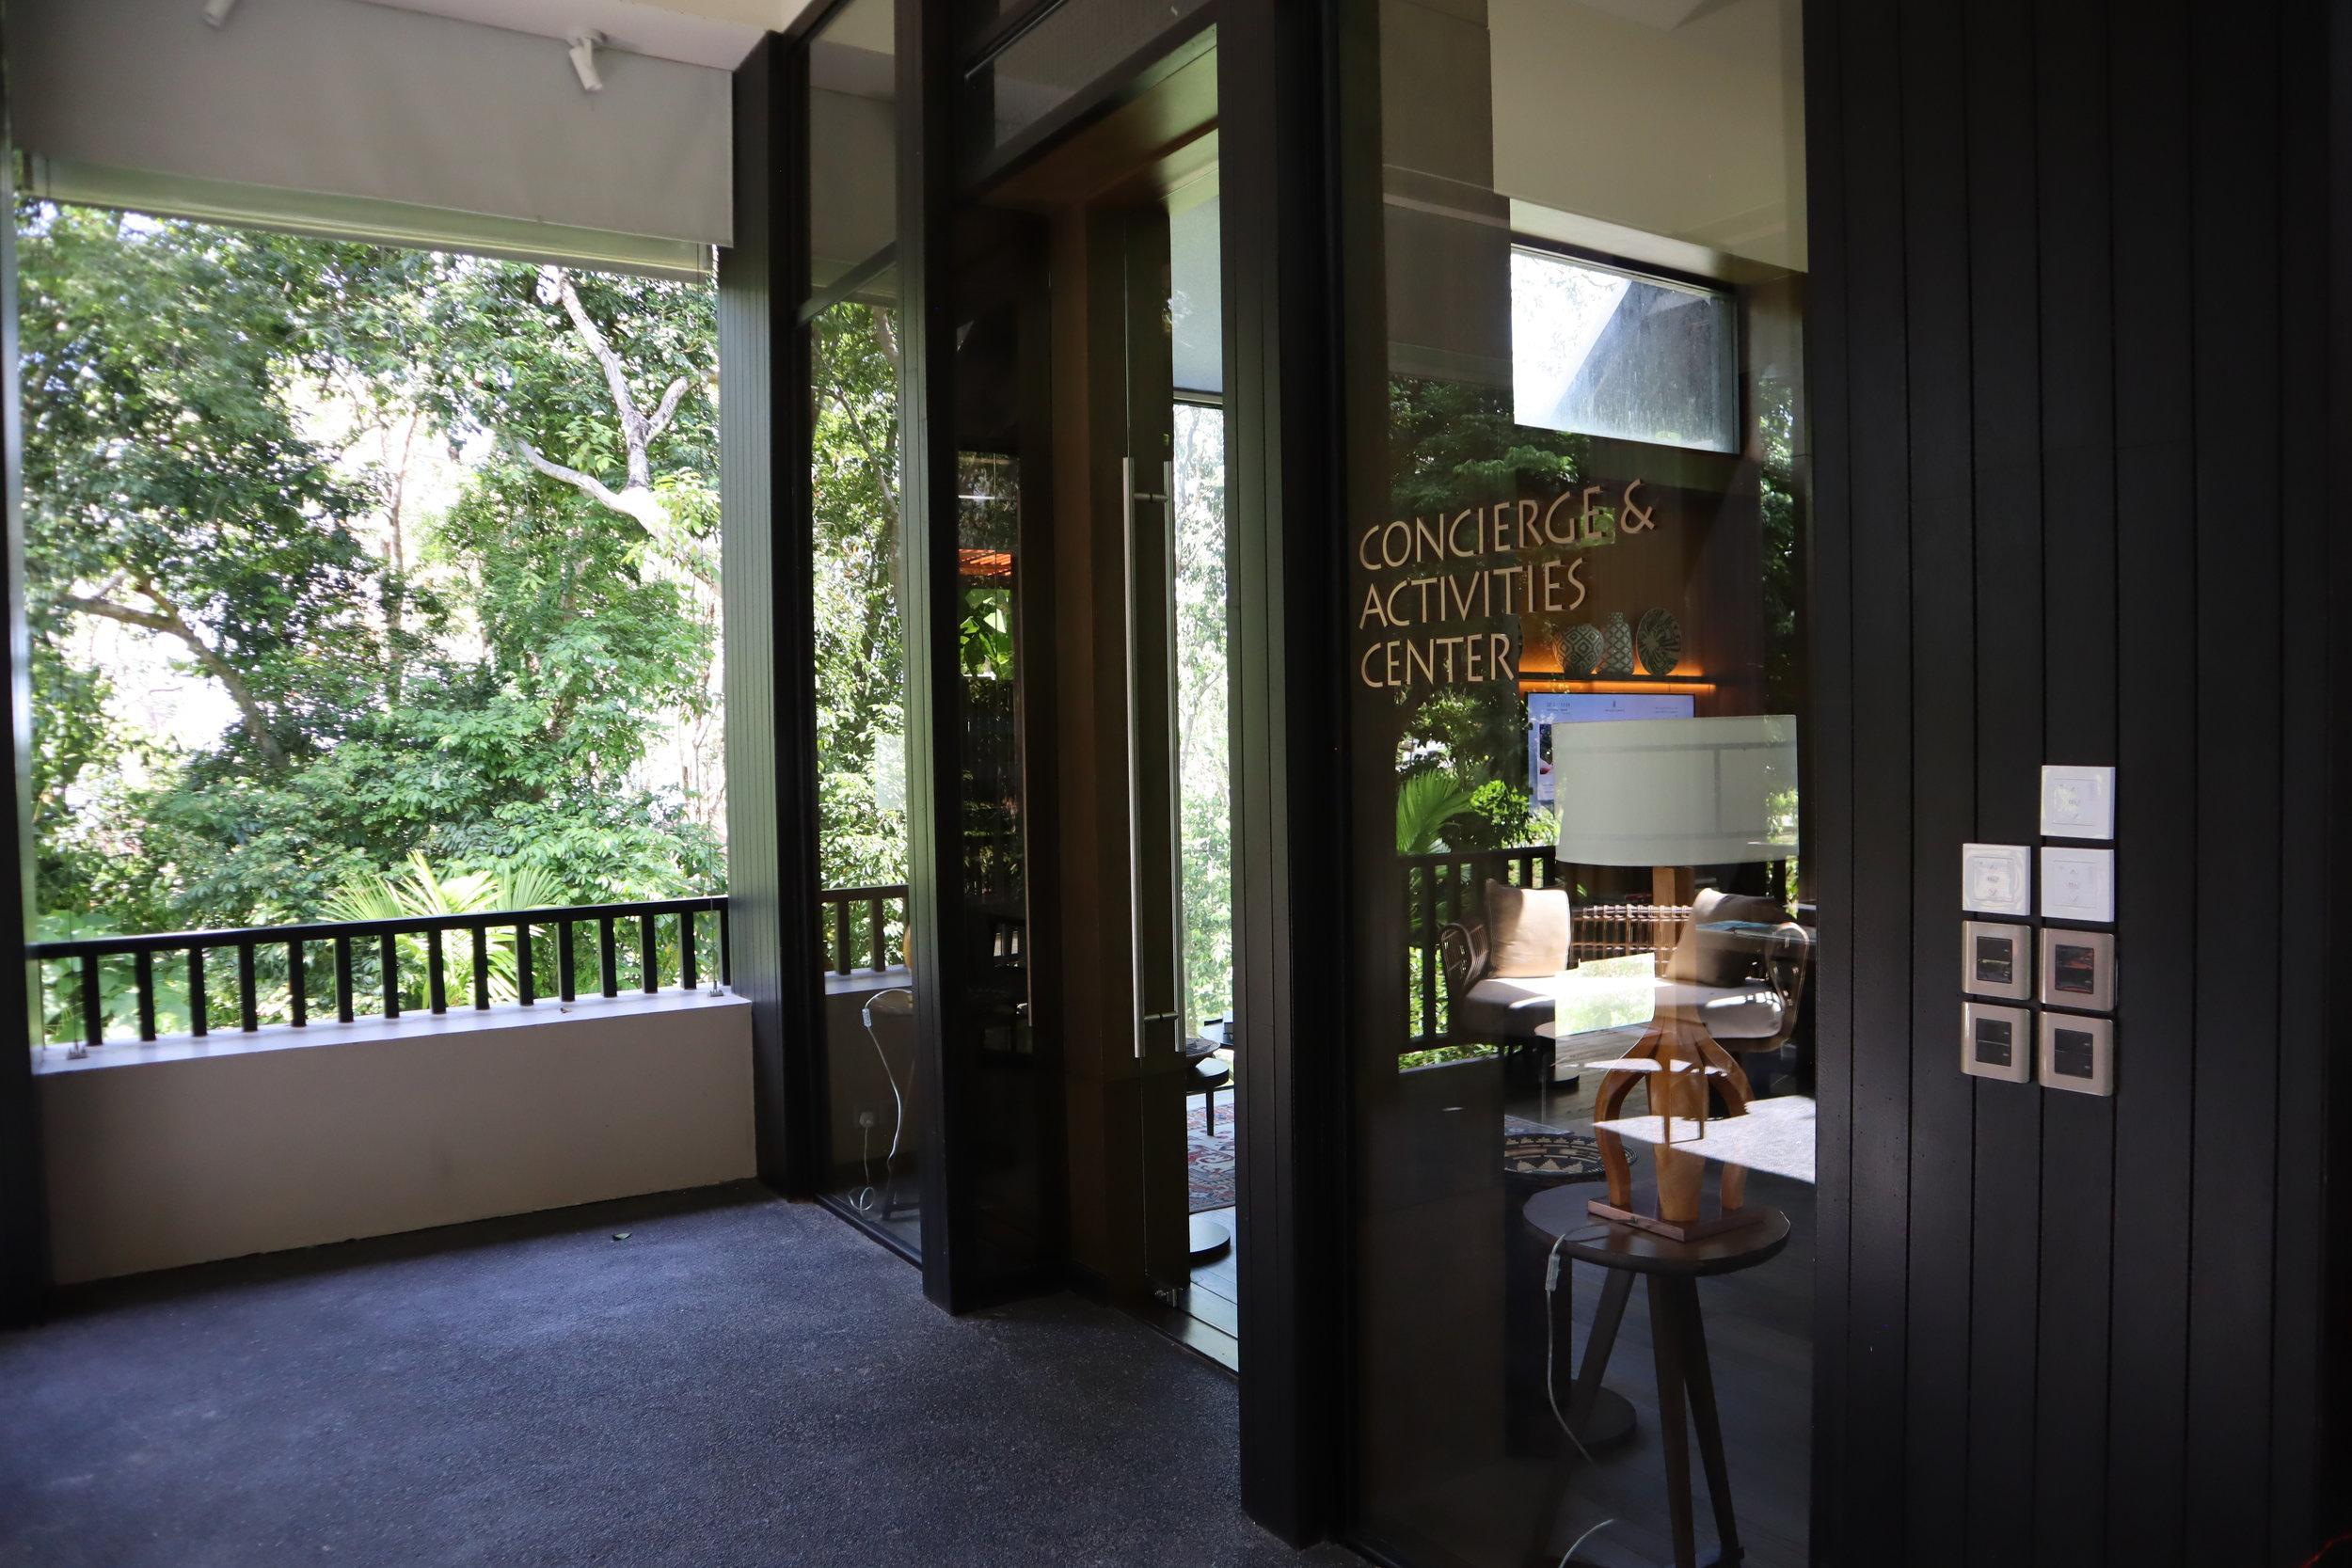 The Ritz-Carlton, Langkawi – Concierge & Activities Center